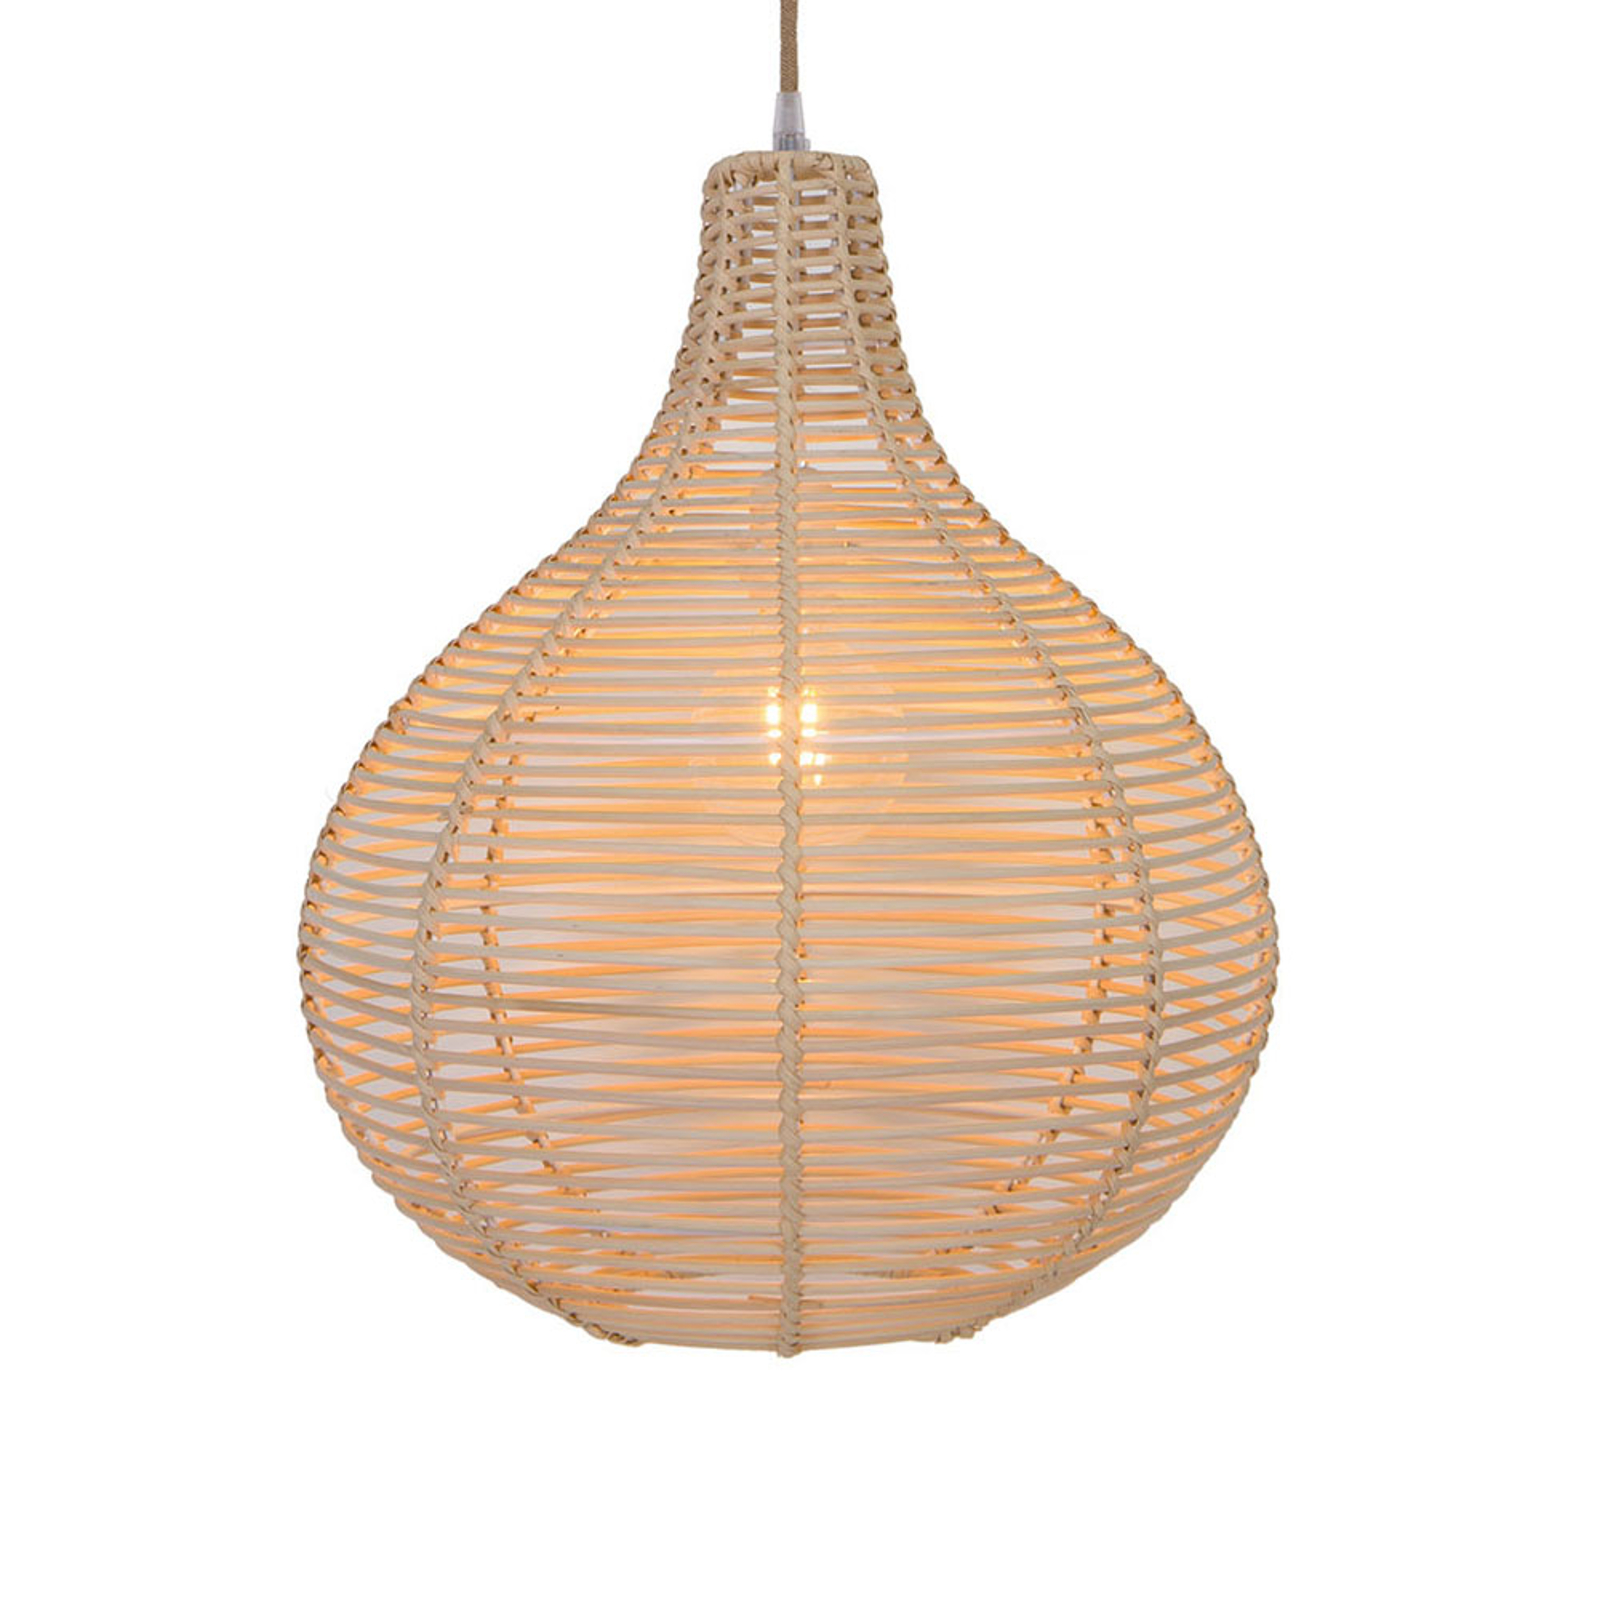 Hanglamp Bolita van hout, Ø 30 cm